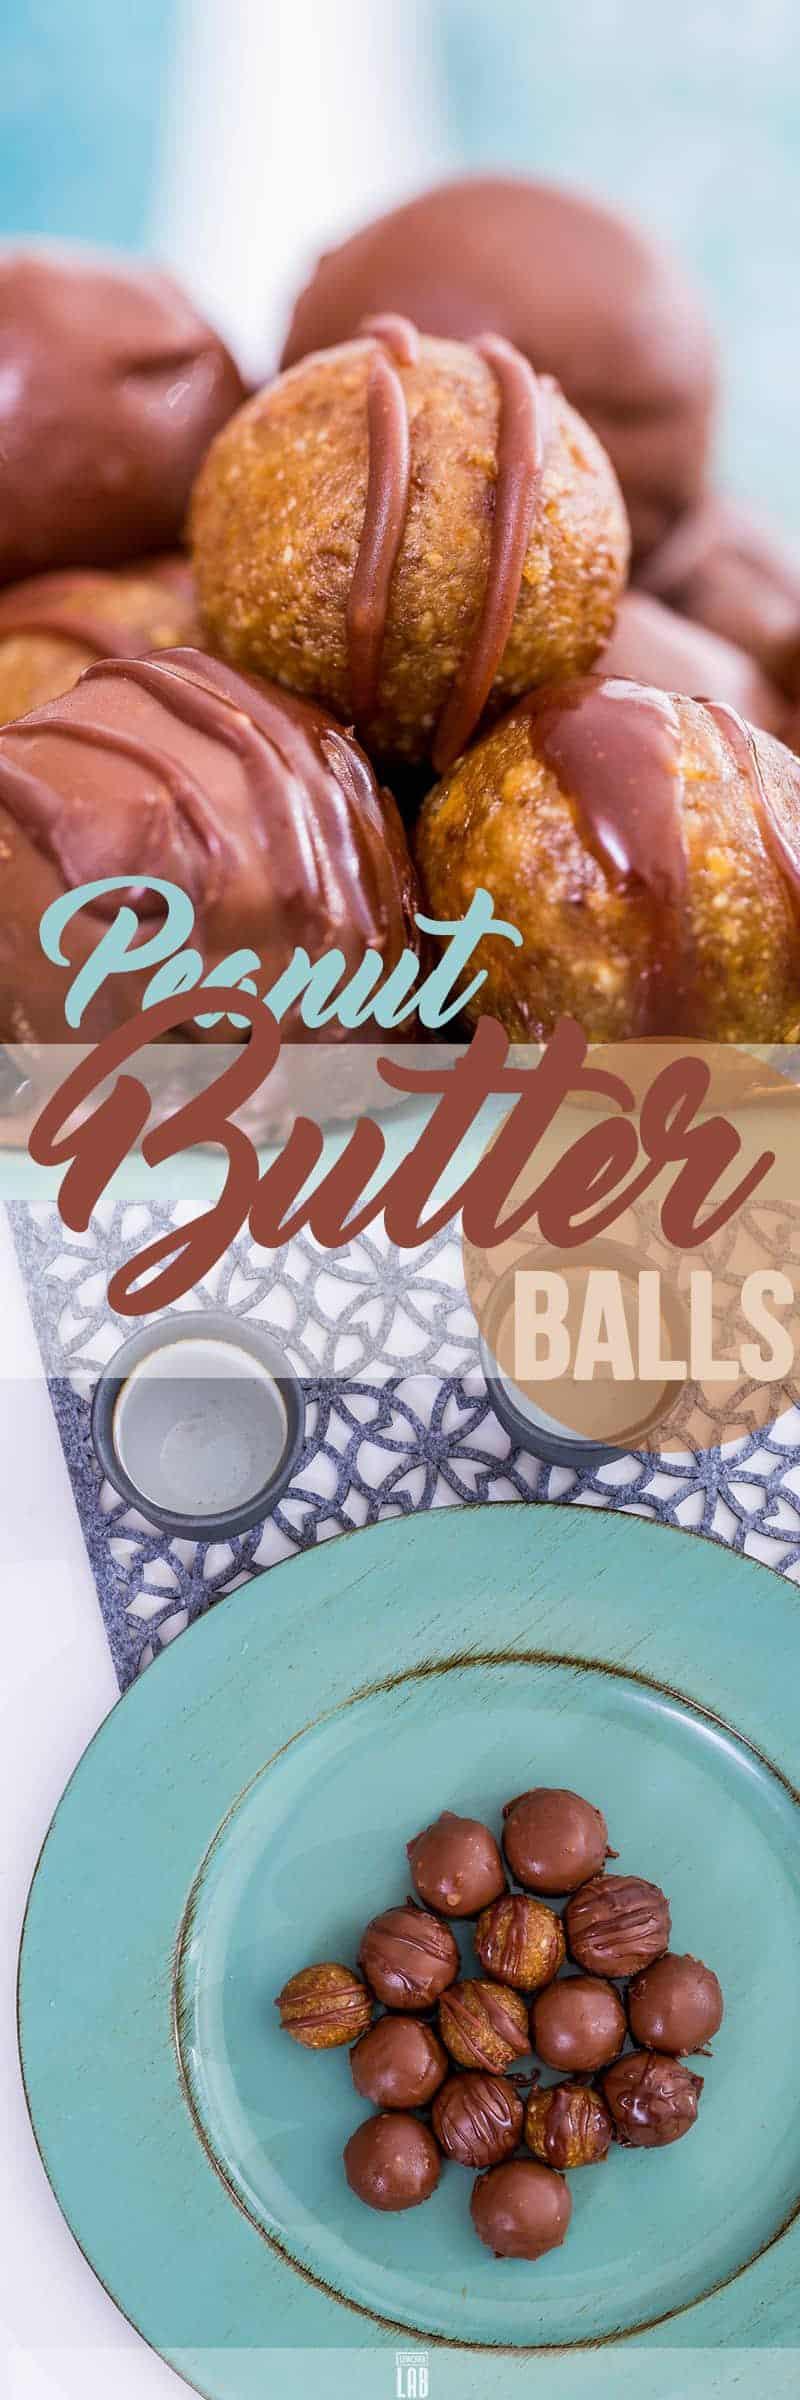 Low-Carb Peanut Butter Balls